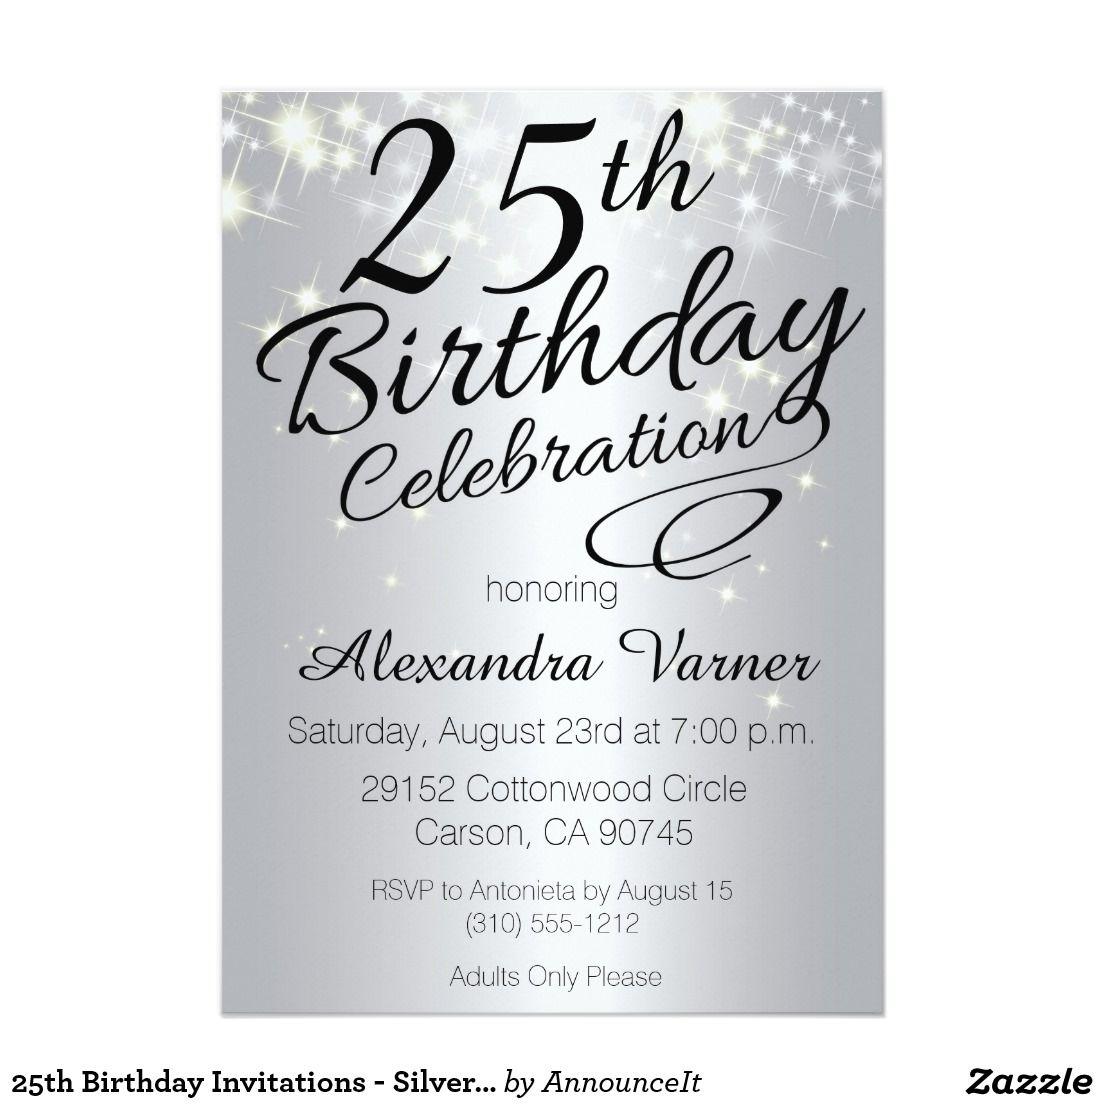 25th birthday invitations silver